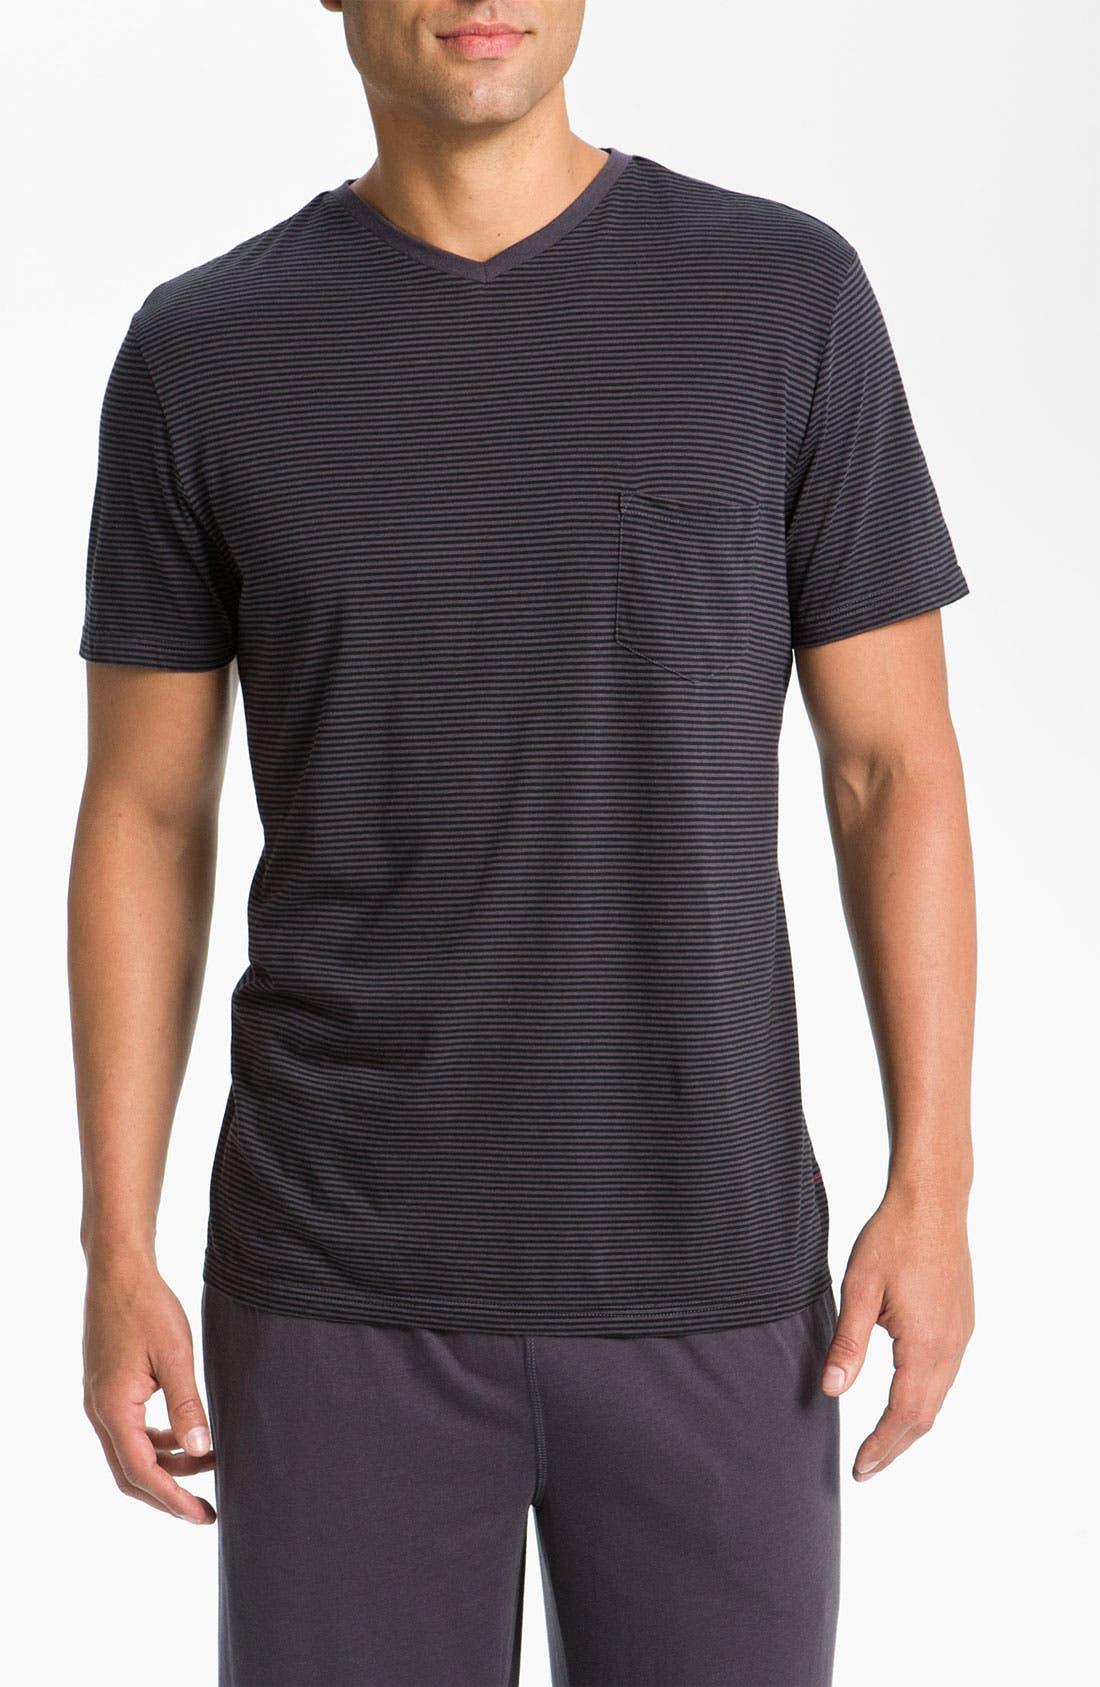 Main Image - Daniel Buchler Lightweight Cotton/Modal Stripe V-Neck T-Shirt